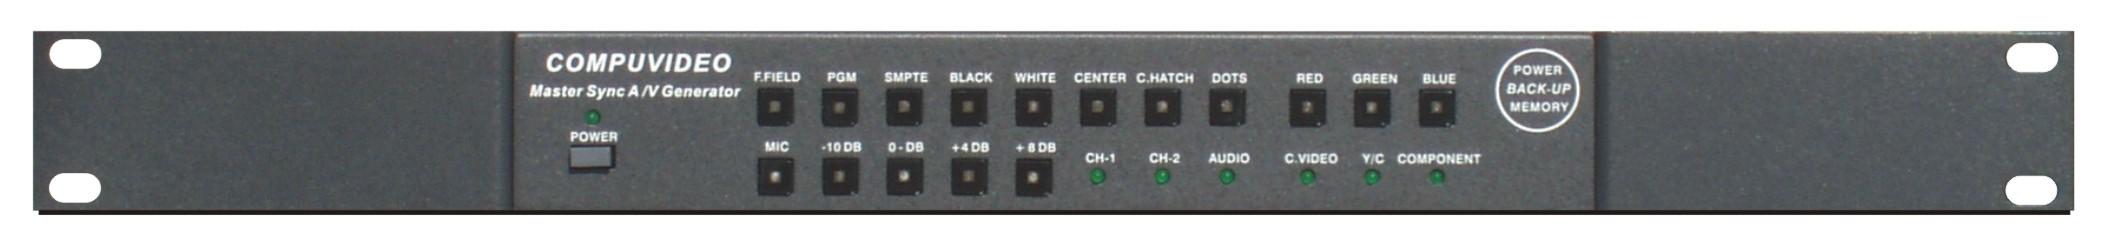 Compuvideo CV-6000 N(RM)